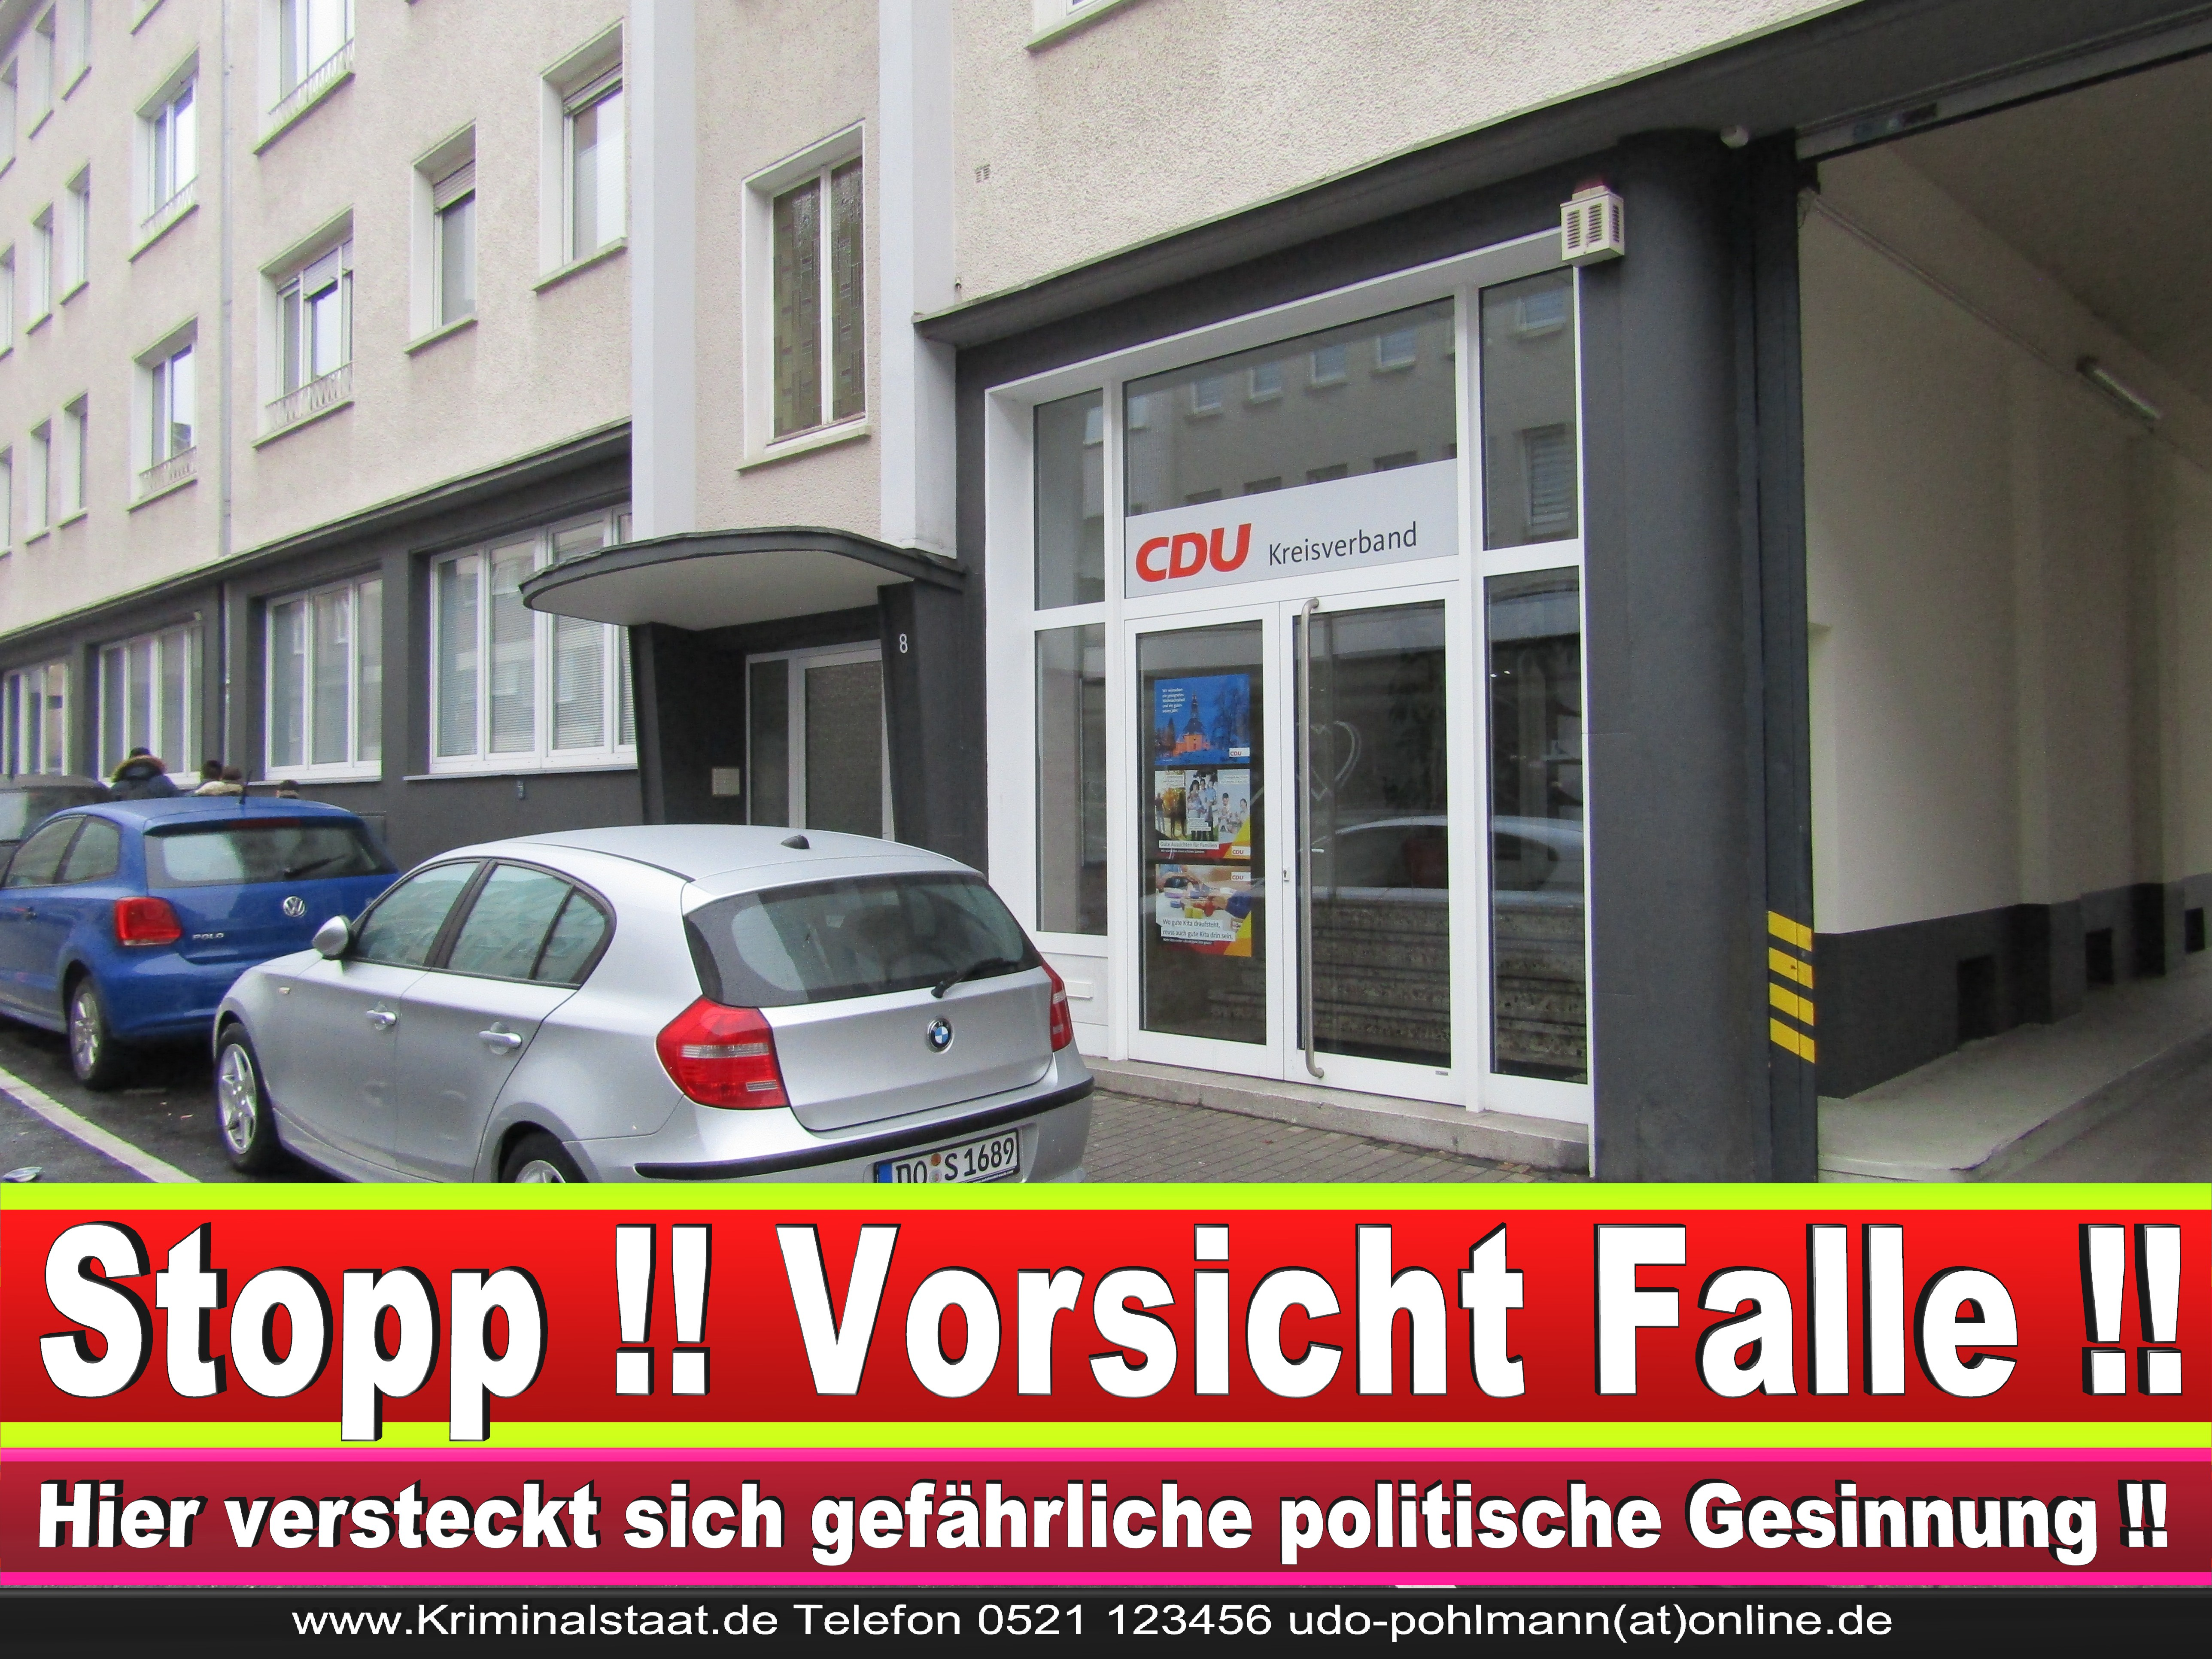 CDU DORTMUND KREISVERBAND BüRGERBüRO CDU FRAKTION ORTSVERBAND CDU NRW GESCHäFTSSTELLE ADRESSE RATSMITGLIEDER CDU (4) 1